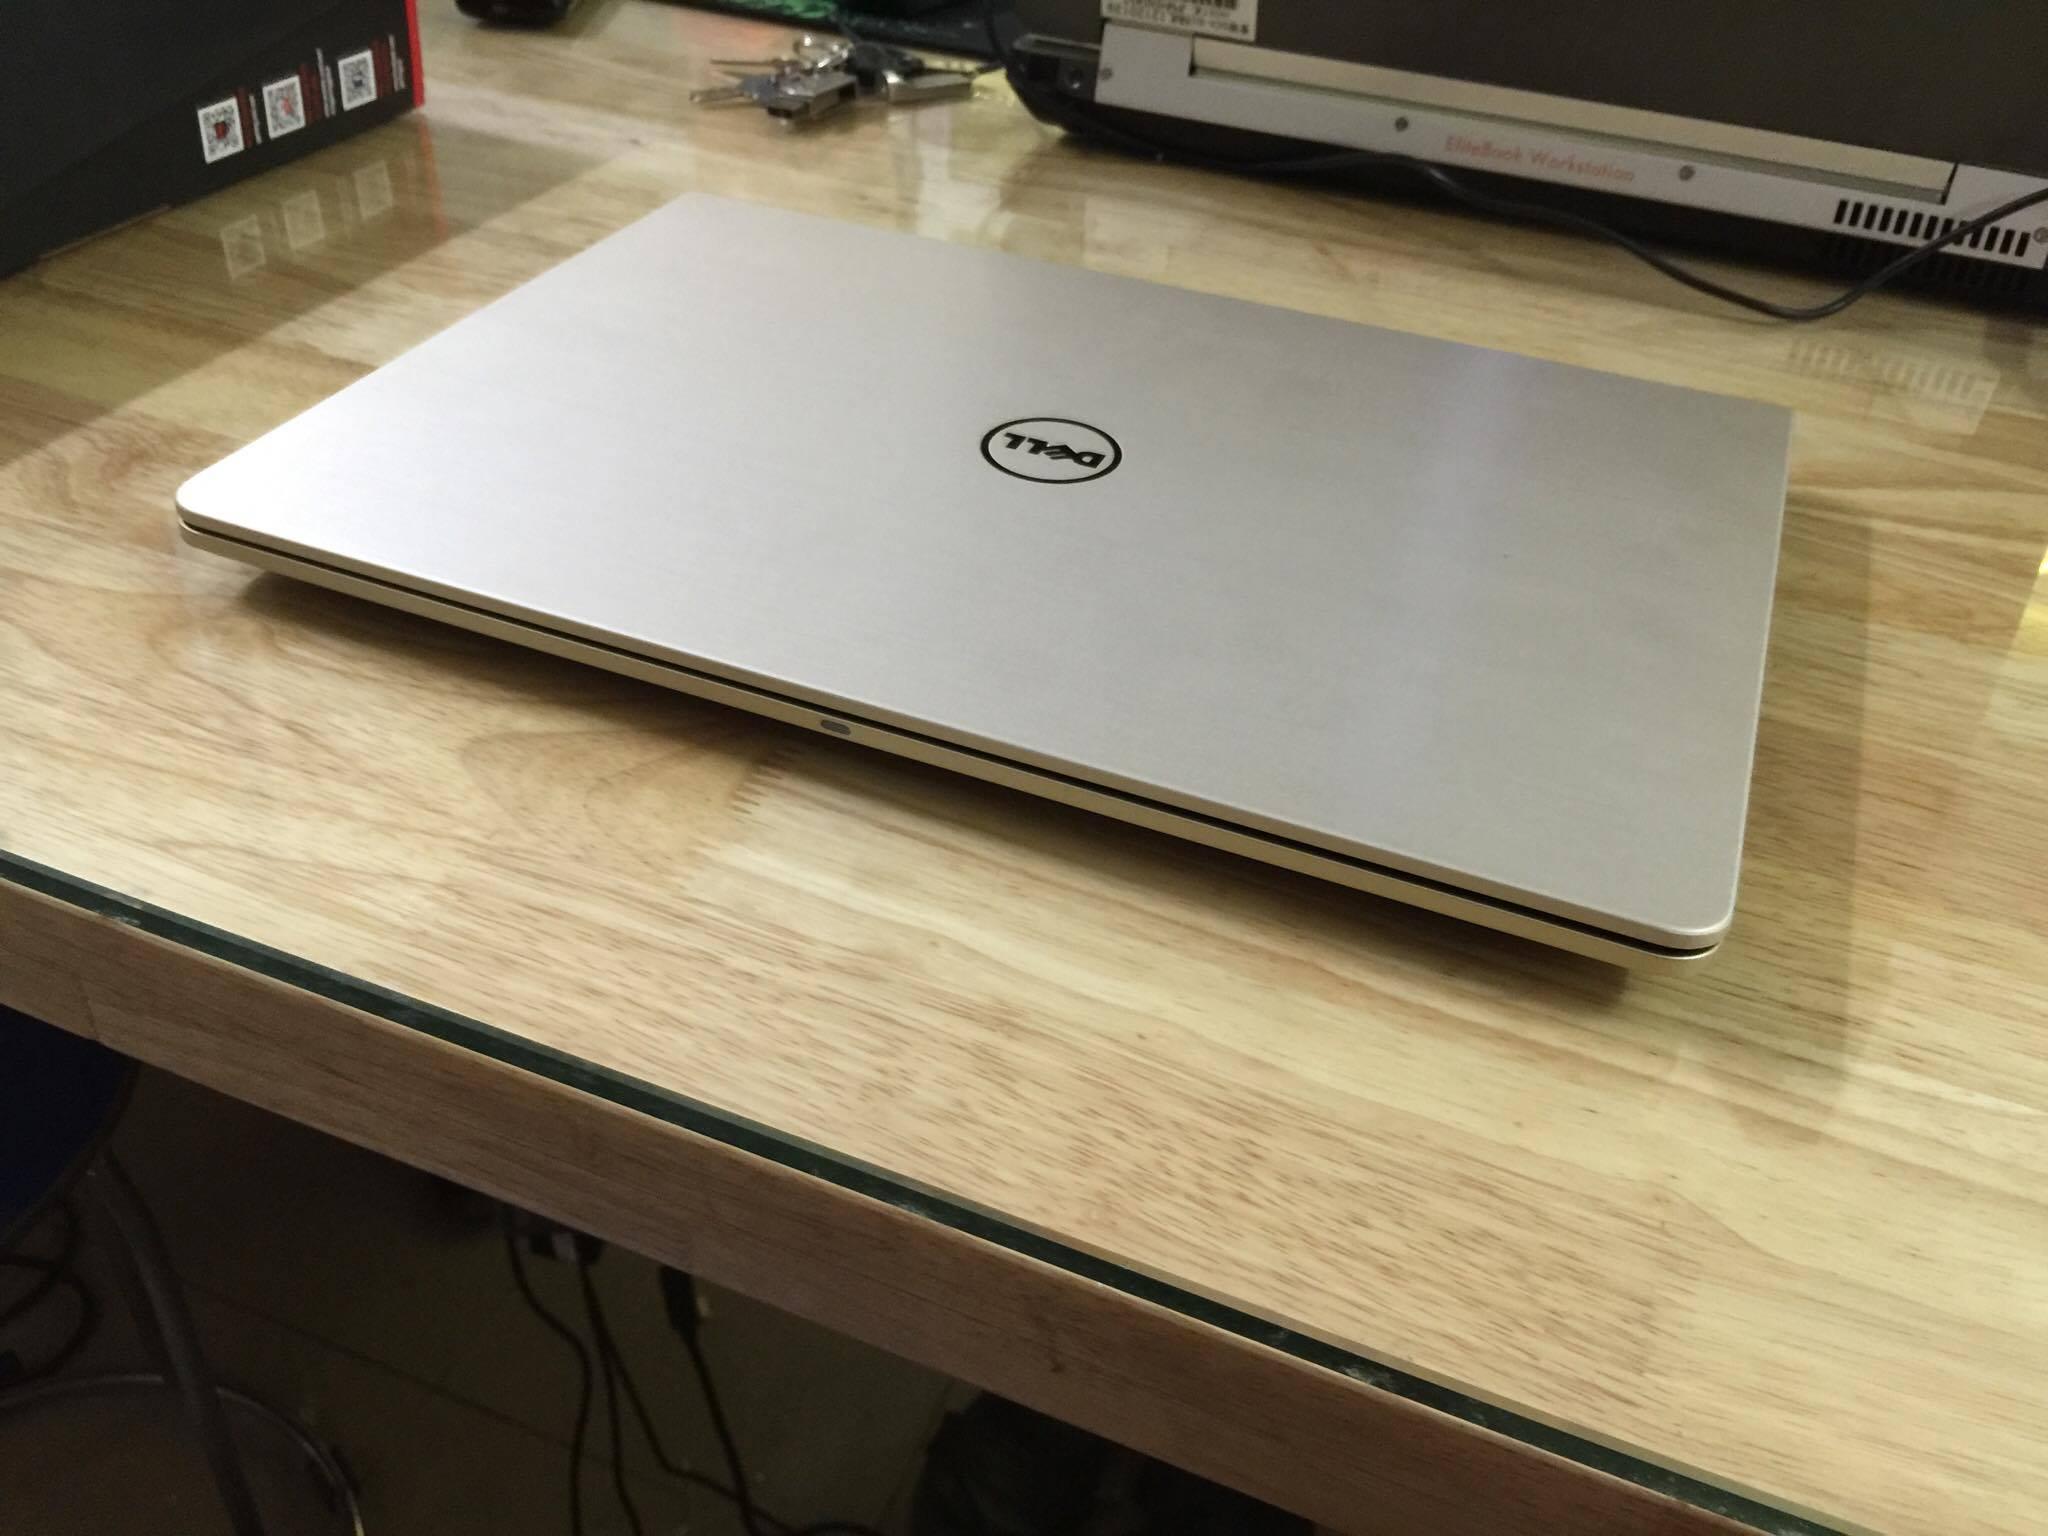 Dell Vostro V5568 Core i5-7200U Ram 4G/HDD 1000G/Nvidia GT940MX 2G